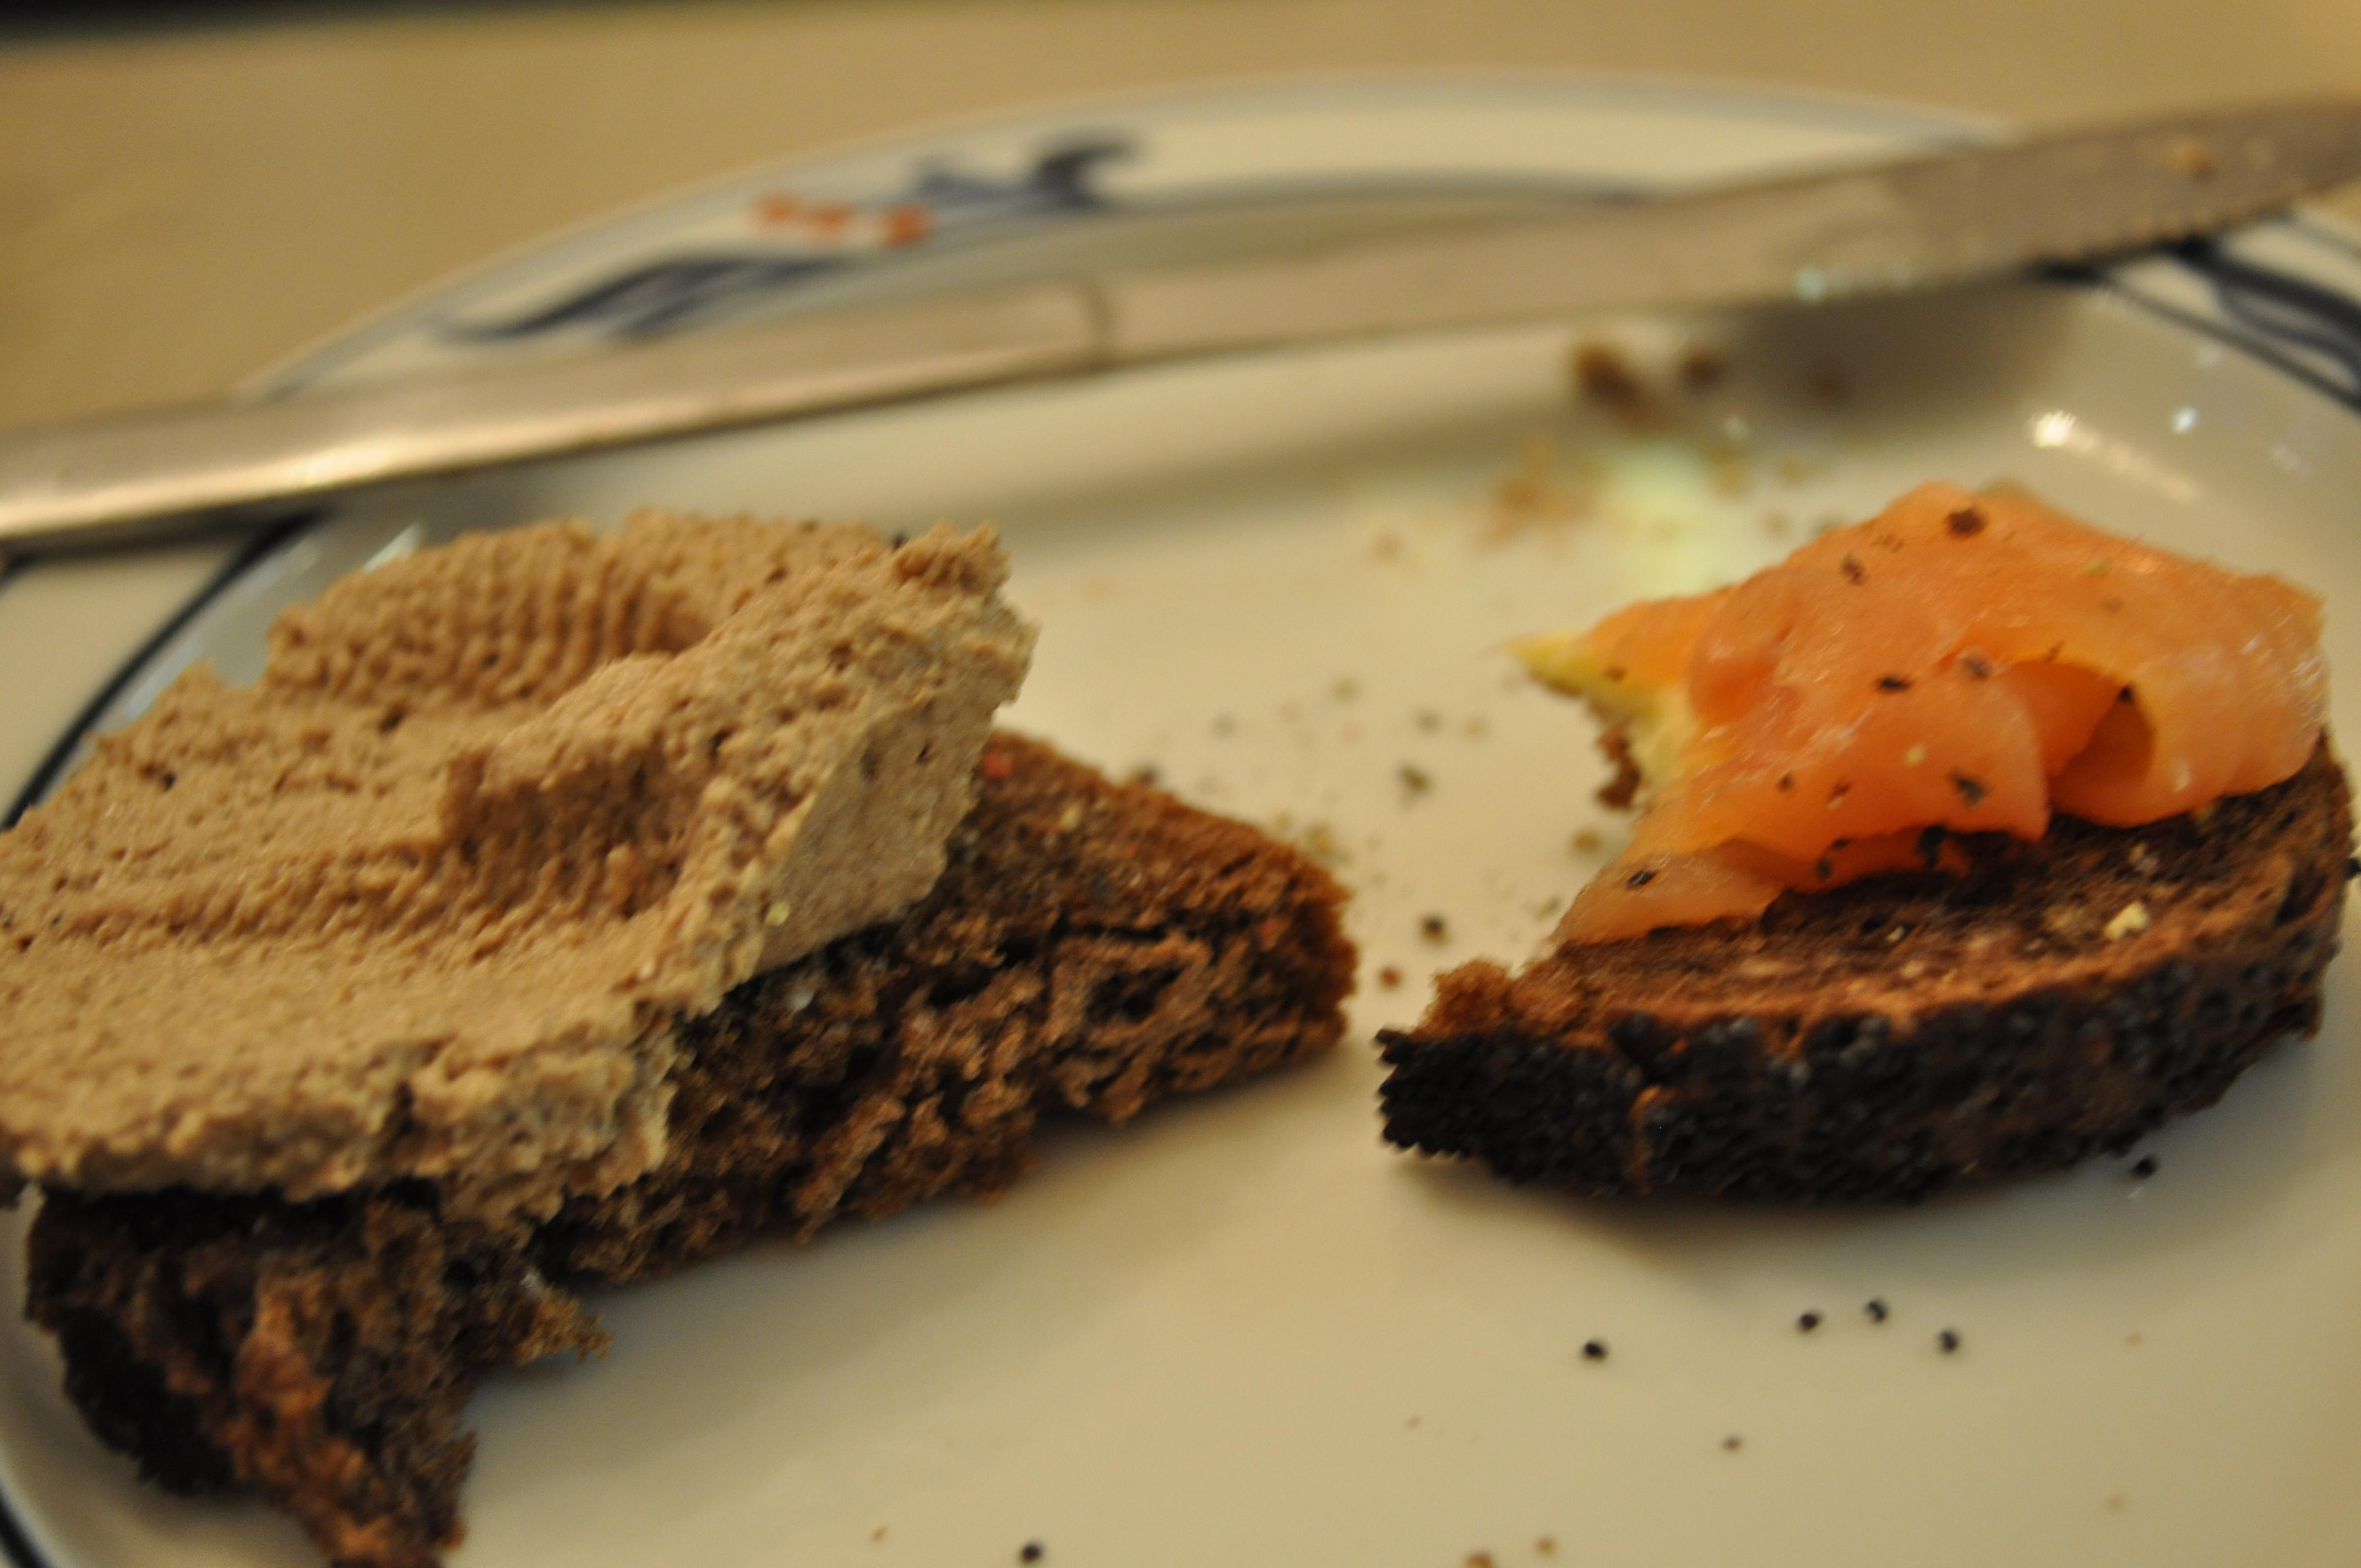 fandf csa and small plates 027